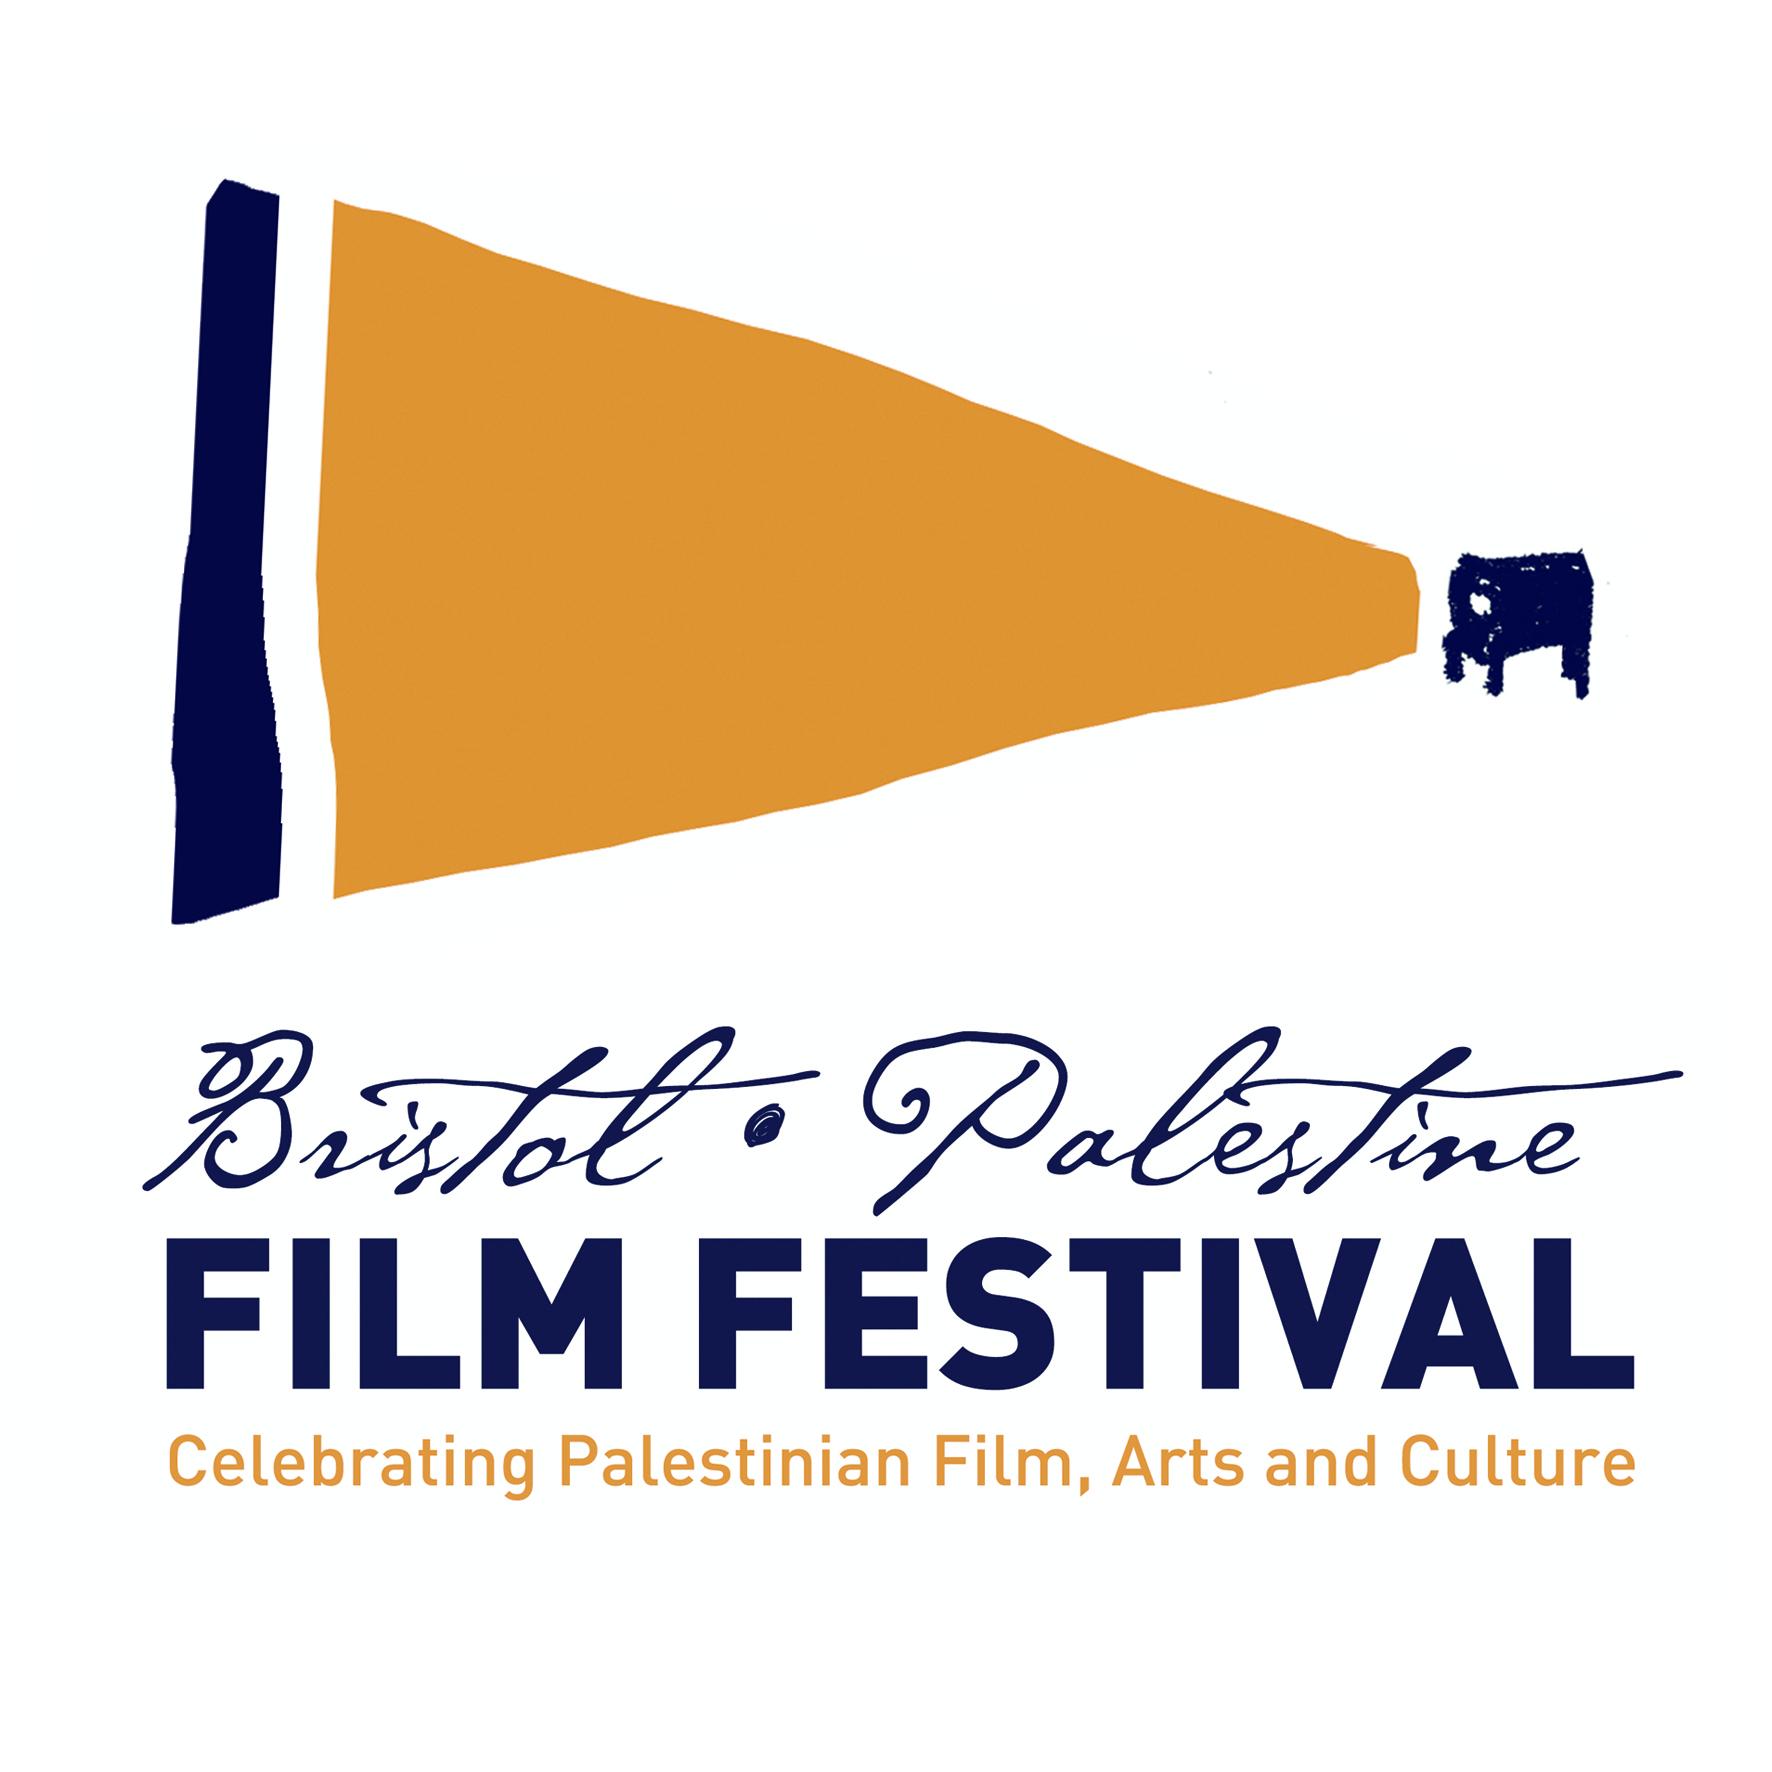 Bristol Palestine Film Festival, 2013